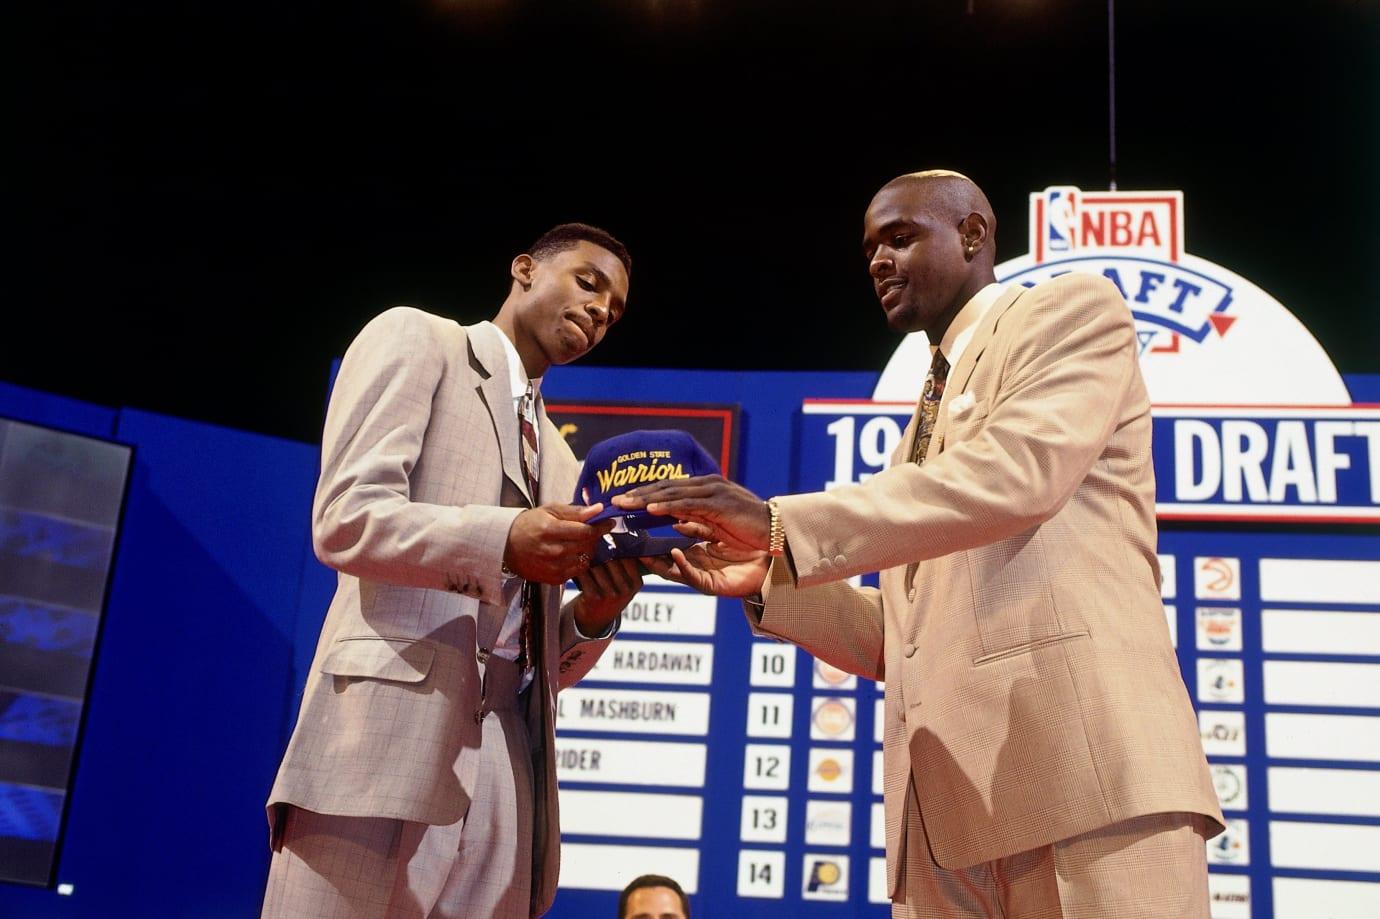 Penny Hardaway & Chris Webber 1993 Draft